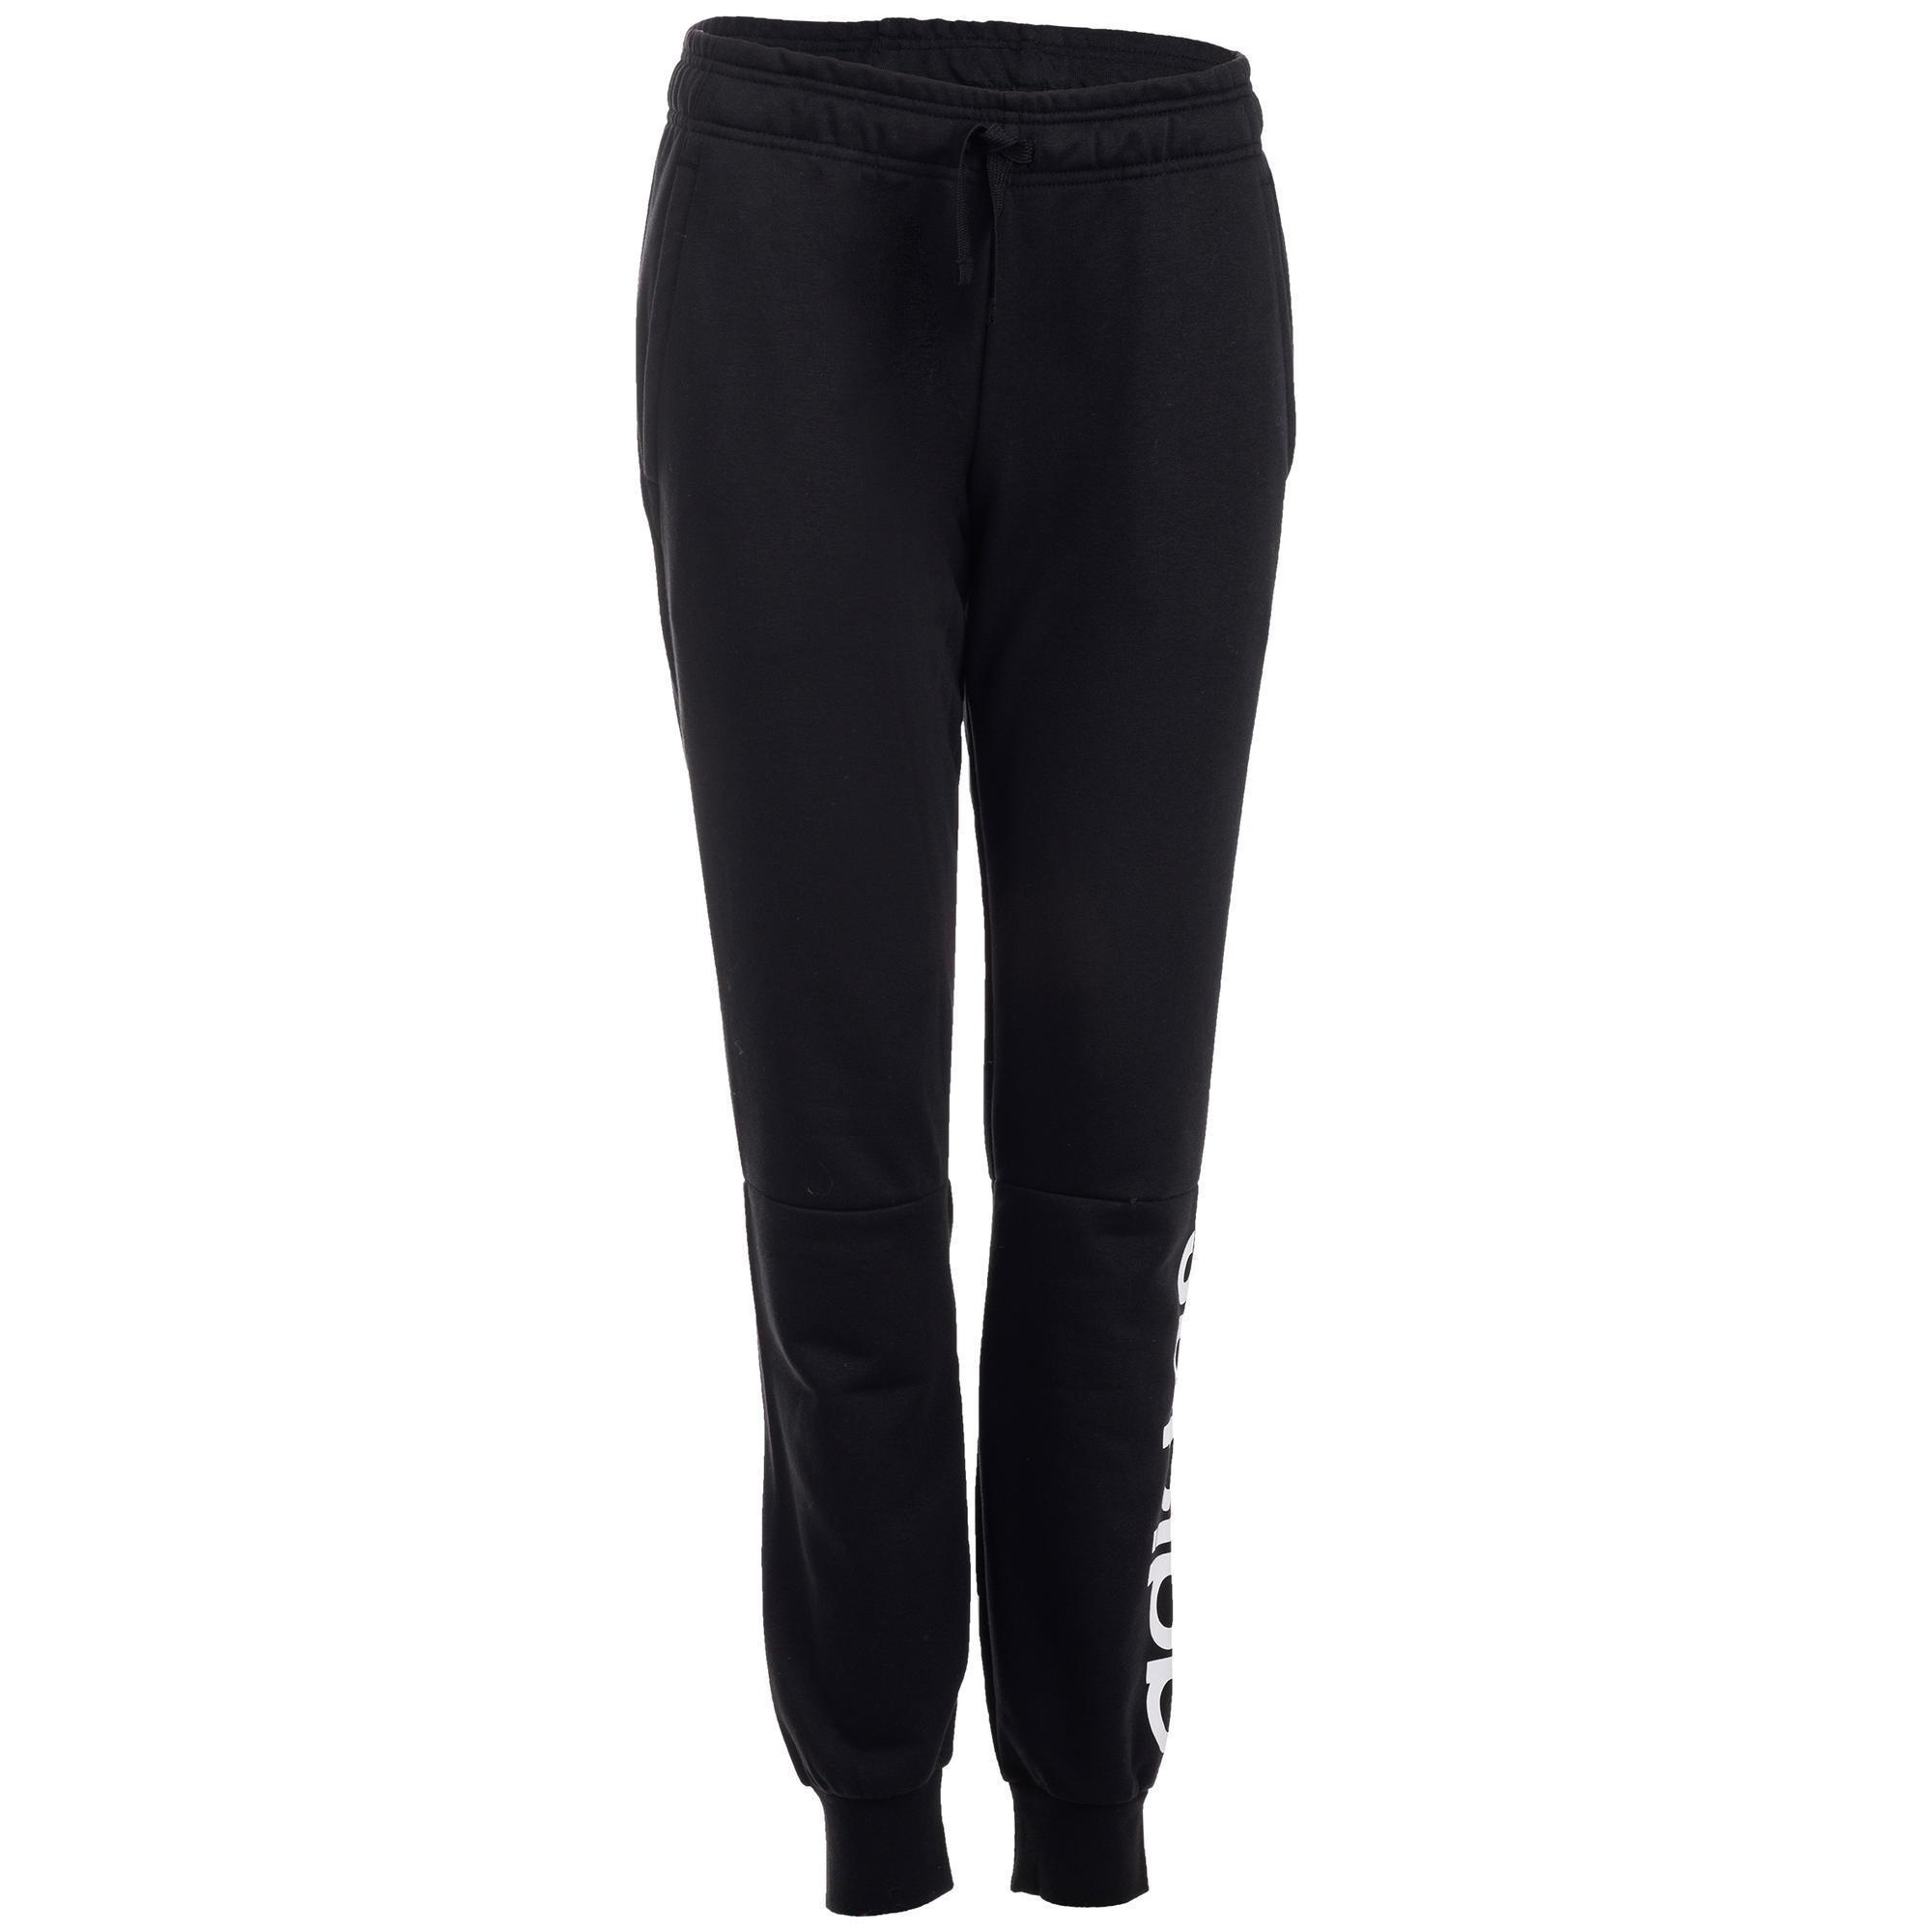 Pantalones Adidas - Decathlon 6974f48cf89b